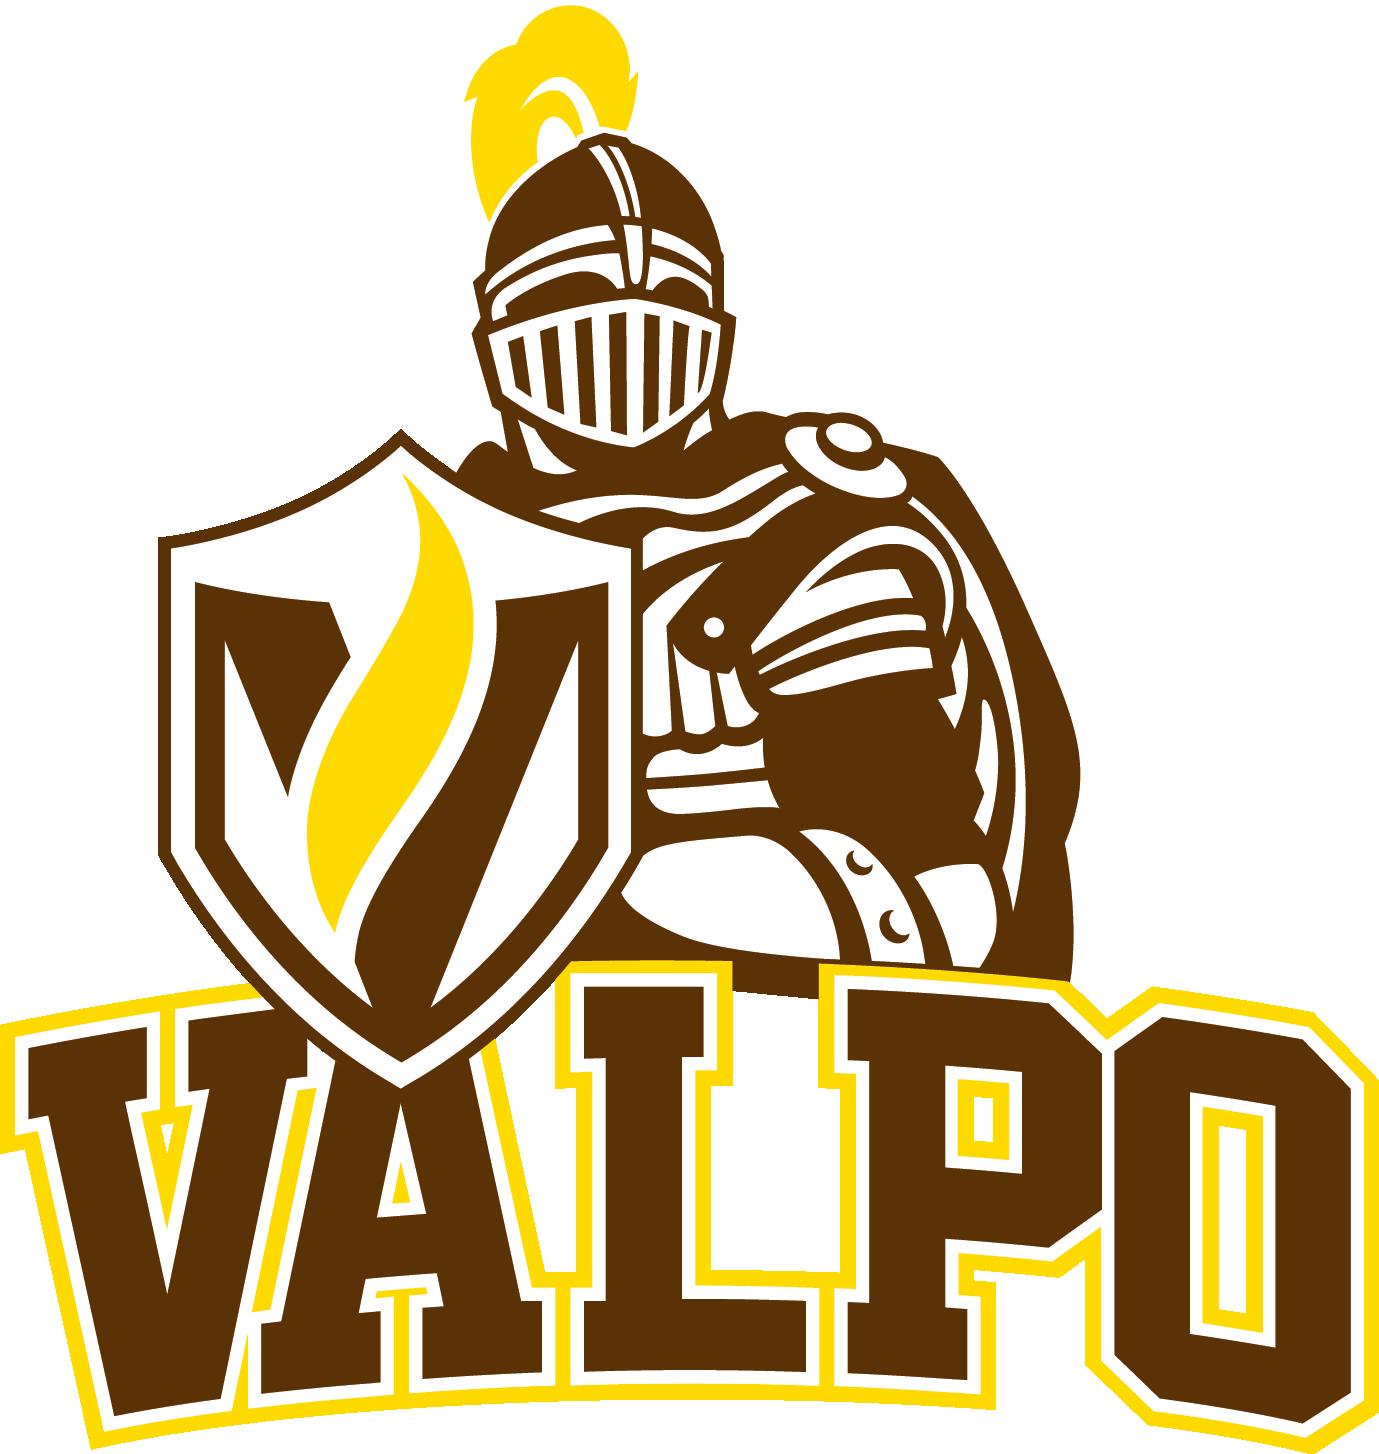 Basketball swish clipart free vector download Manitoba's Daniel Sackey Commits to NCAA D1 Valparaiso University ... vector download